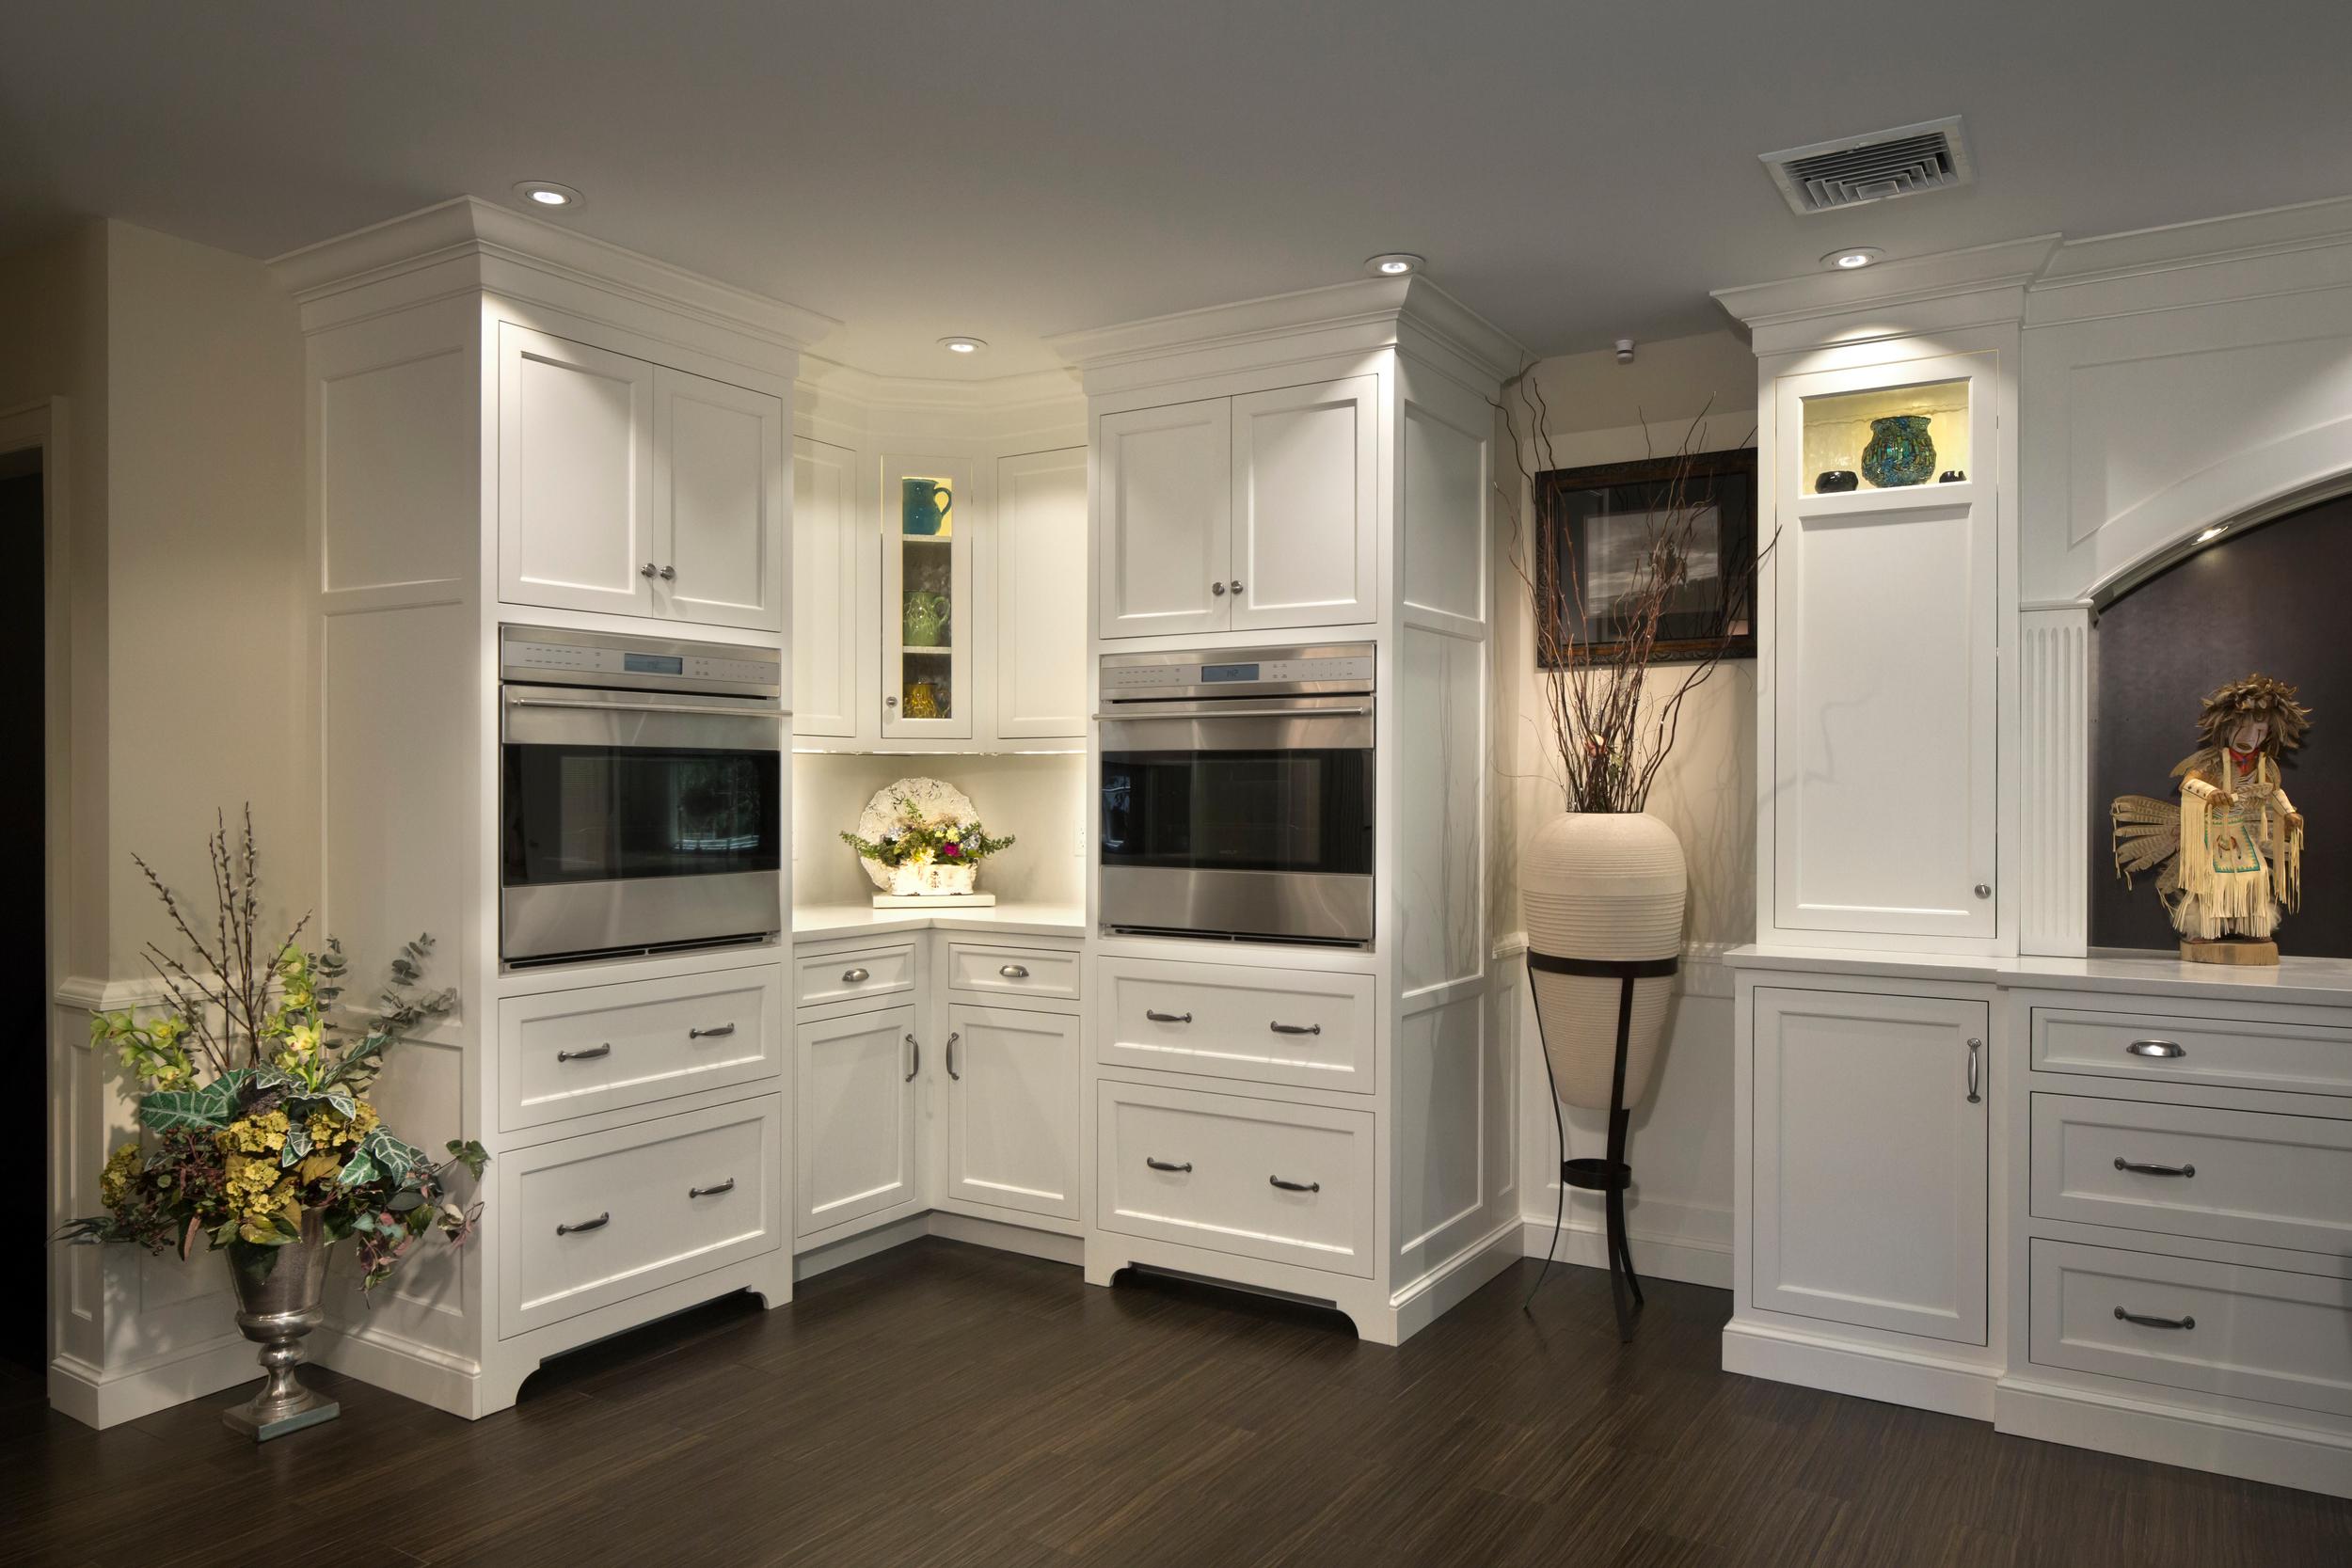 Elite Kitchen & Bath image 4